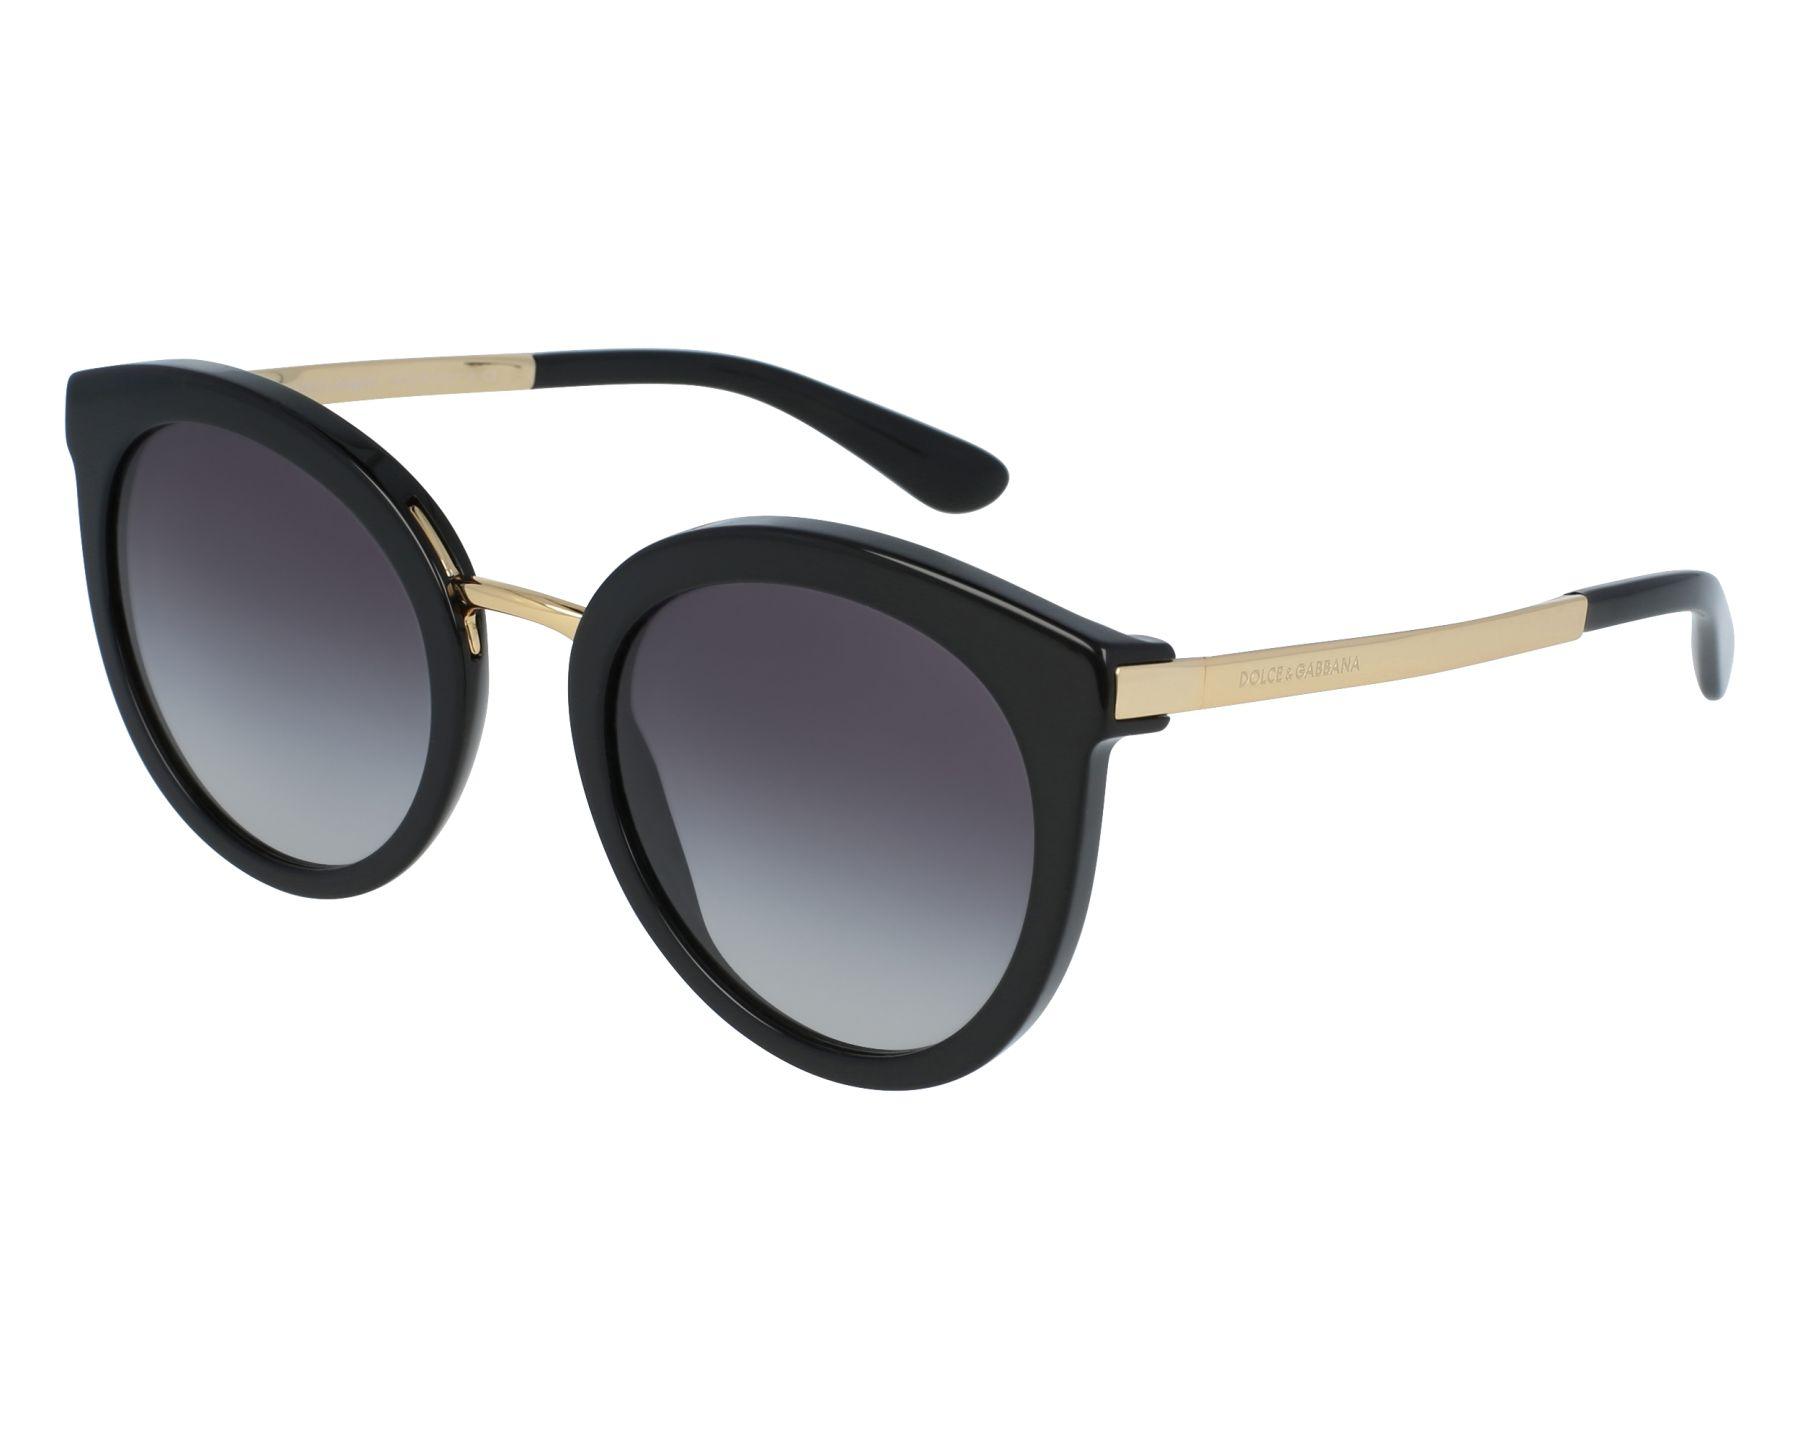 8f528b18d65 Sunglasses Dolce   Gabbana DG-4268 501 8G 52-22 Black Gold front